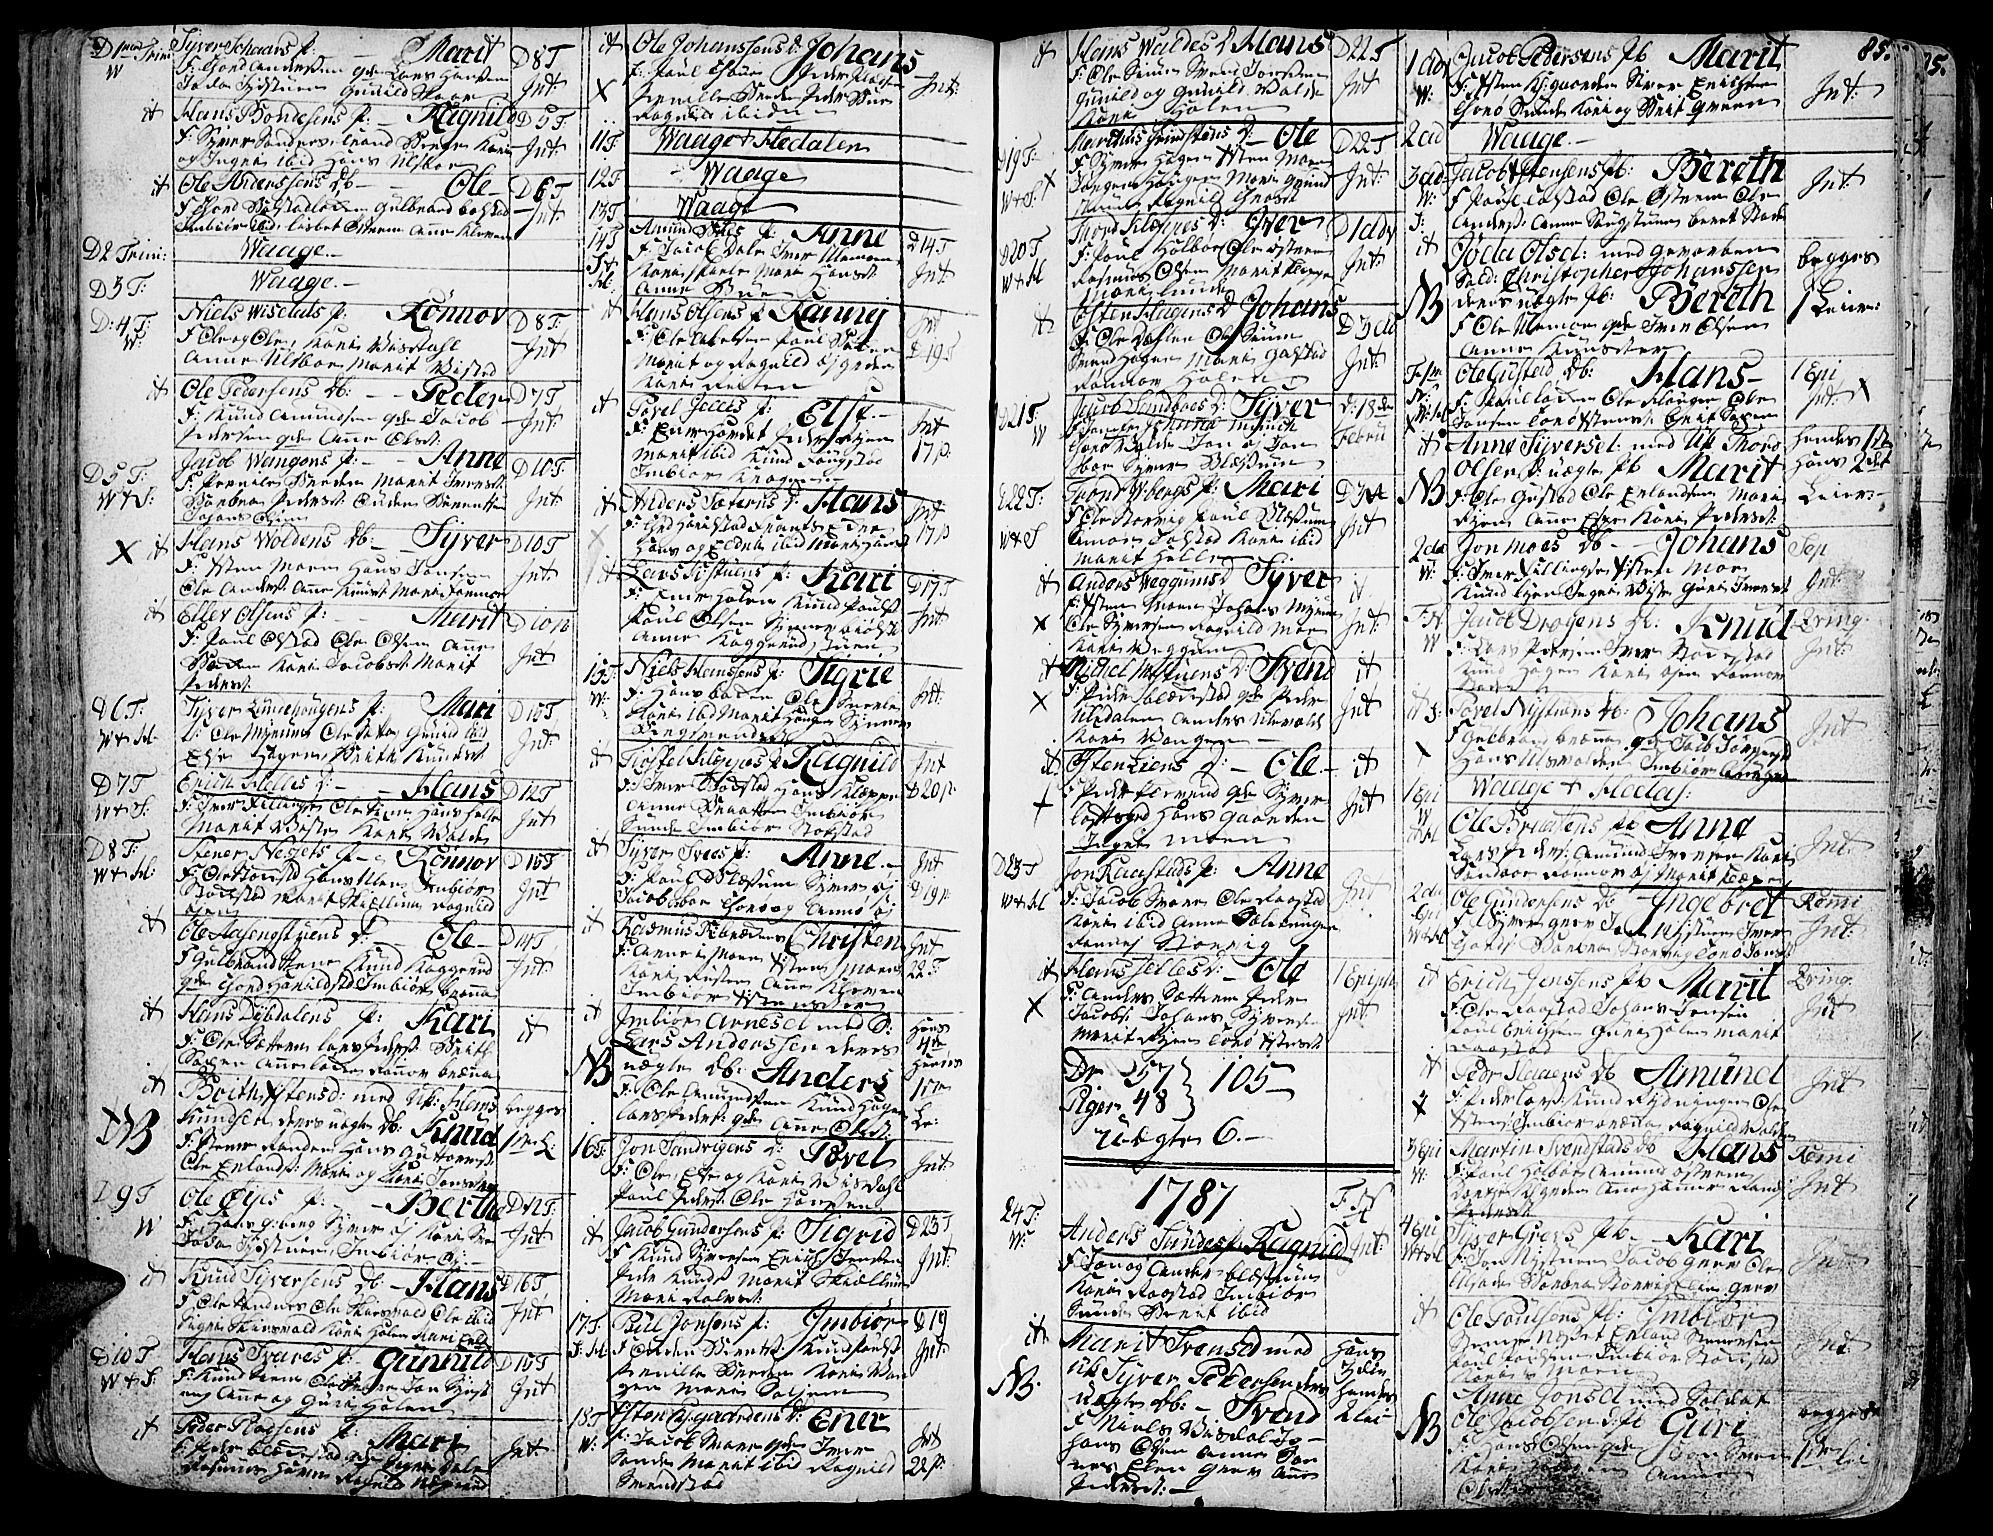 SAH, Vågå prestekontor, Ministerialbok nr. 1, 1739-1810, s. 85